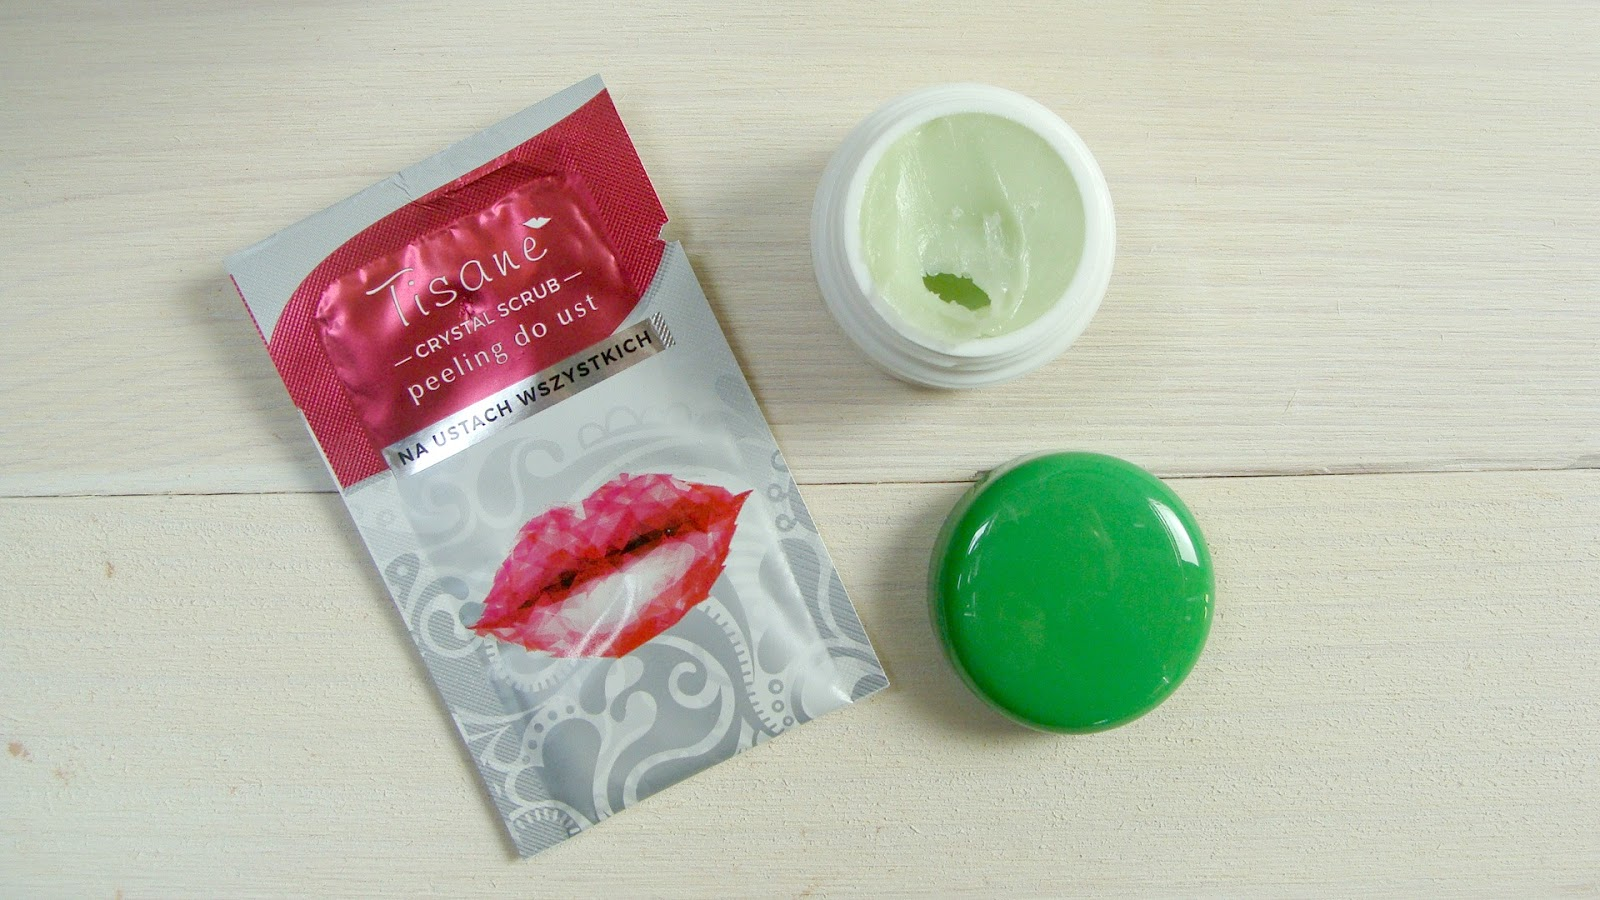 Nowości od Tisane - peeling do ust i balsam Fresh